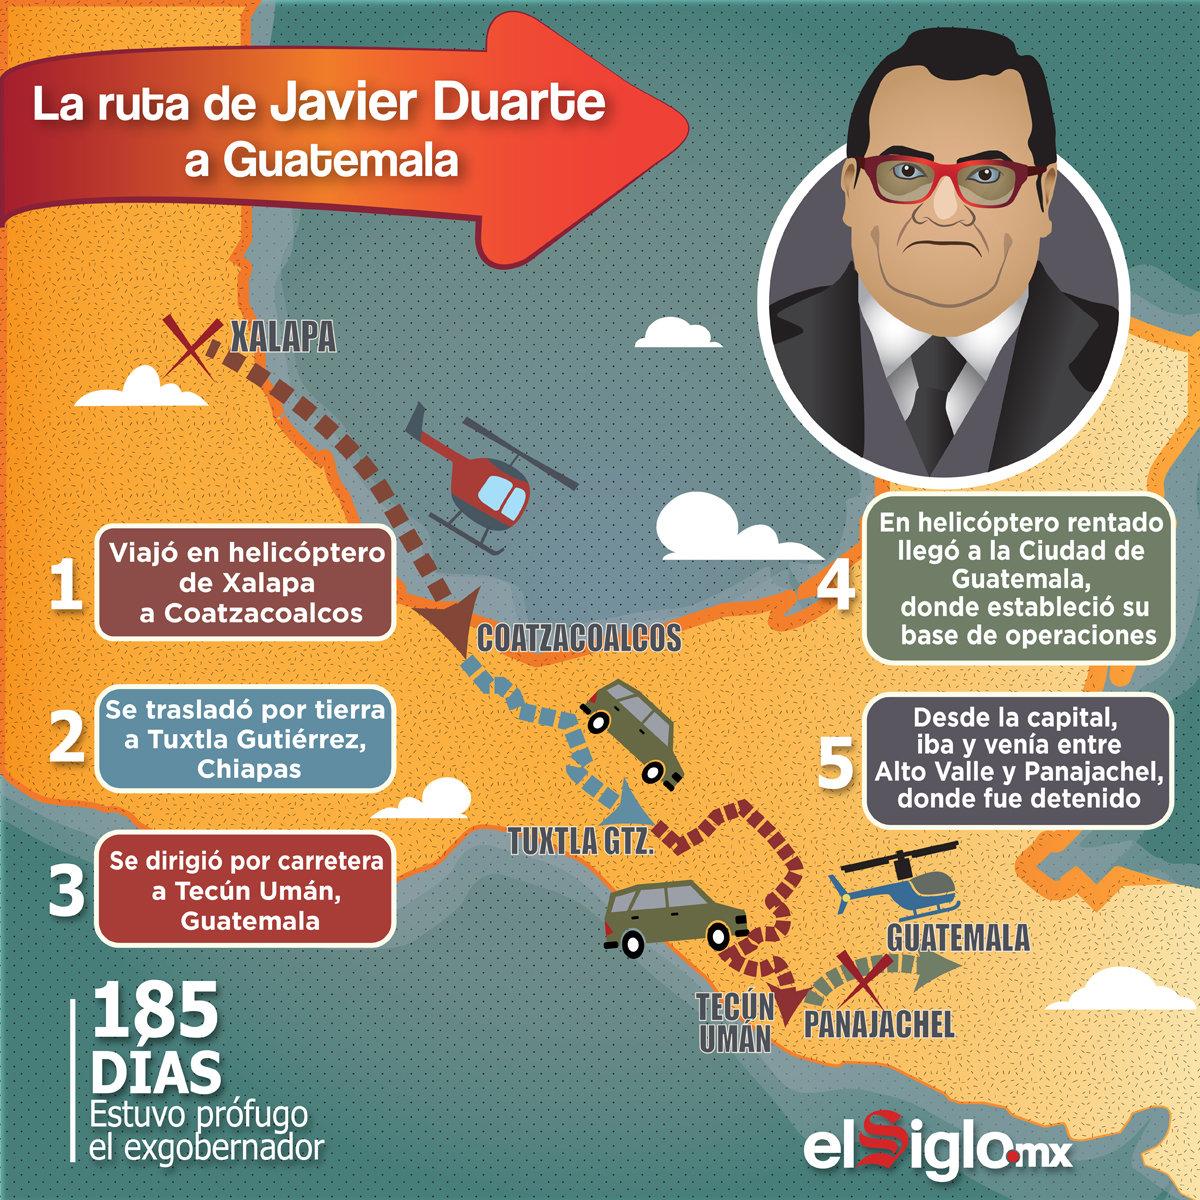 La ruta de Javier Duarte a Guatemala